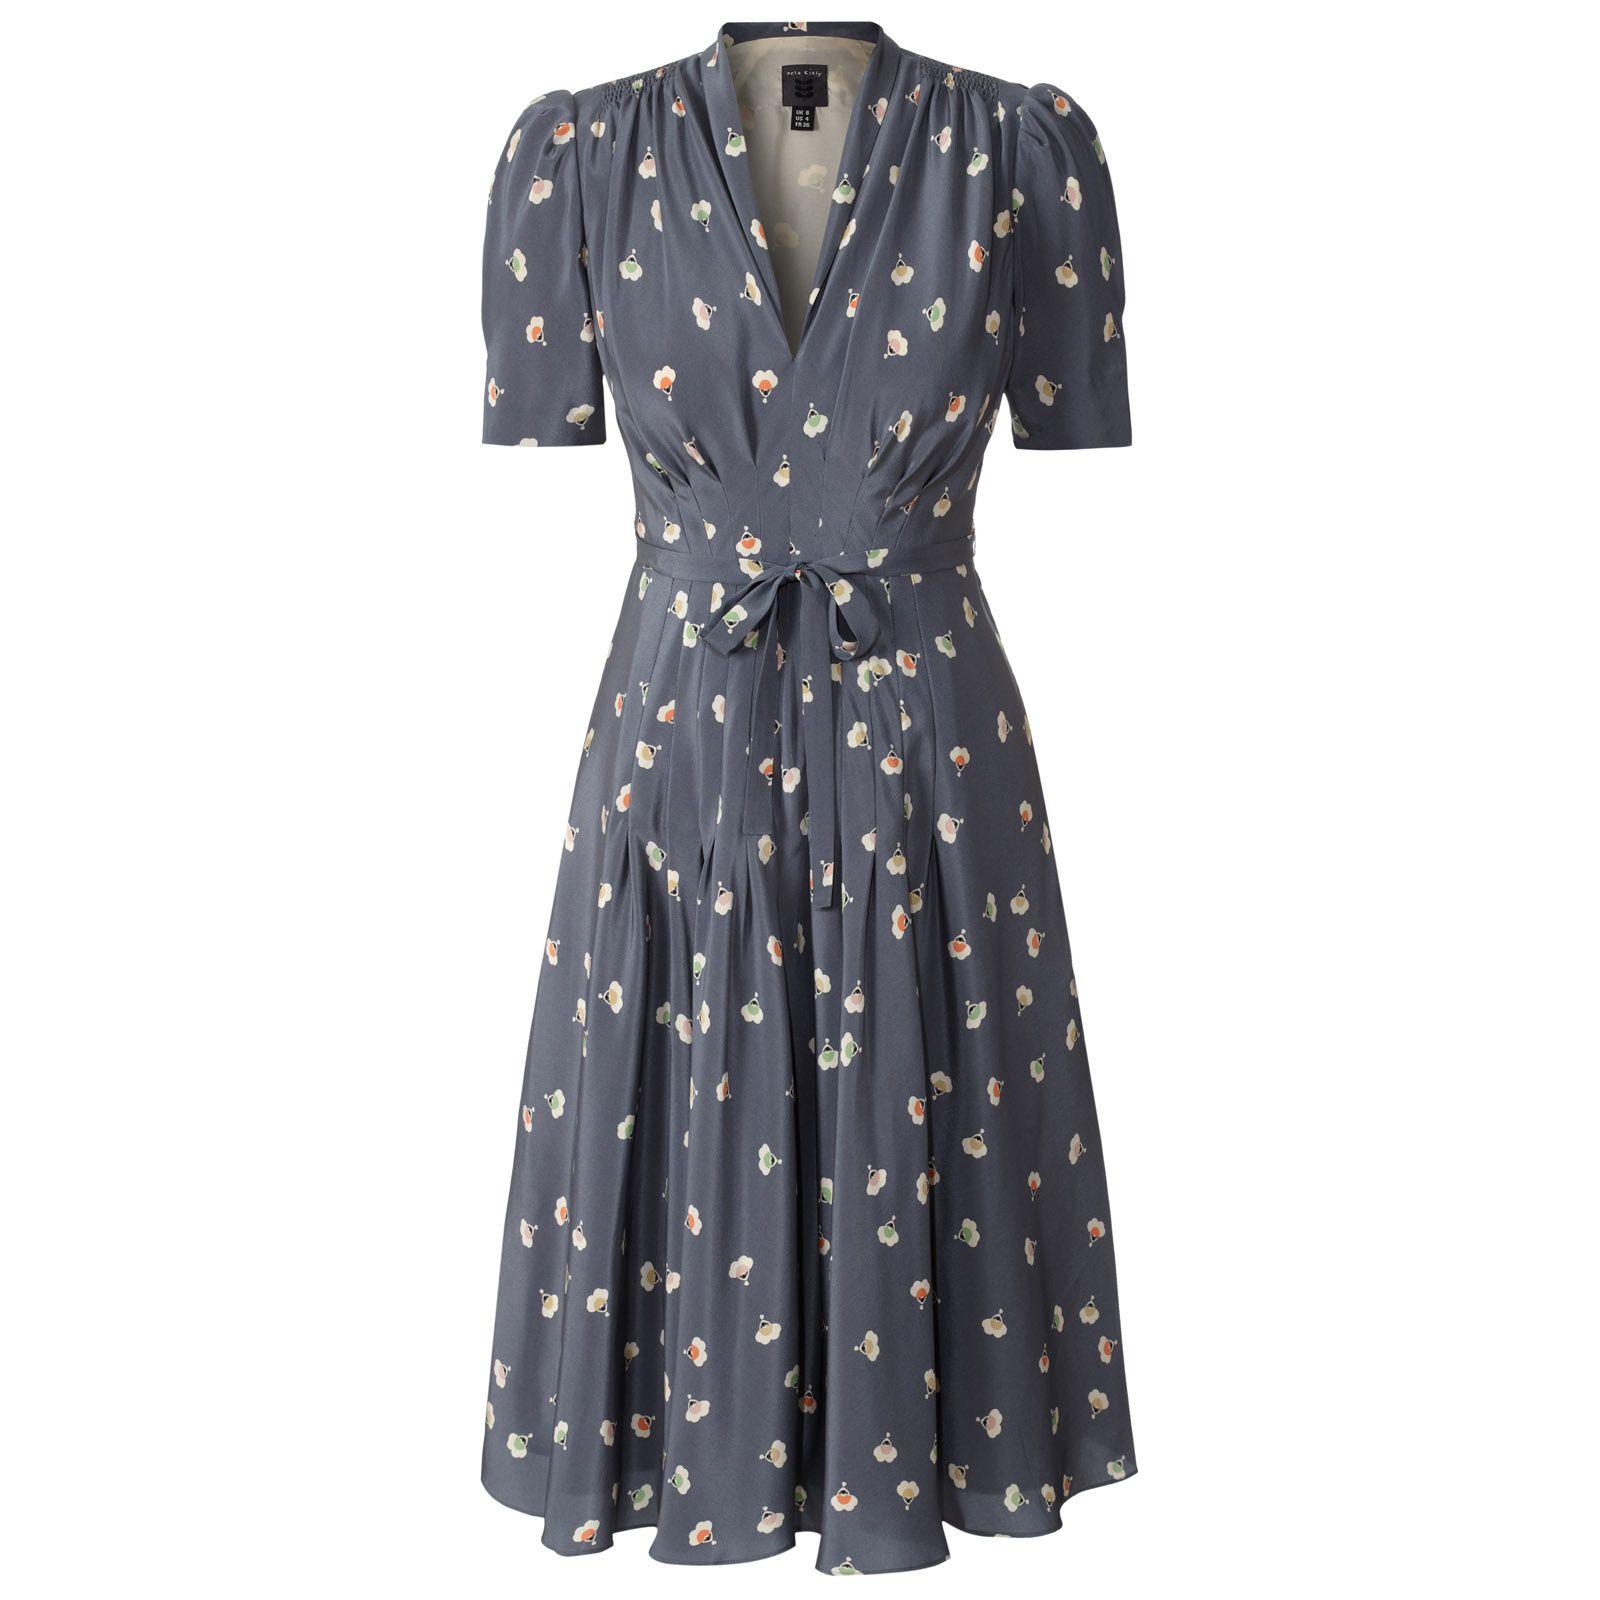 10++ Orla kelly dress information